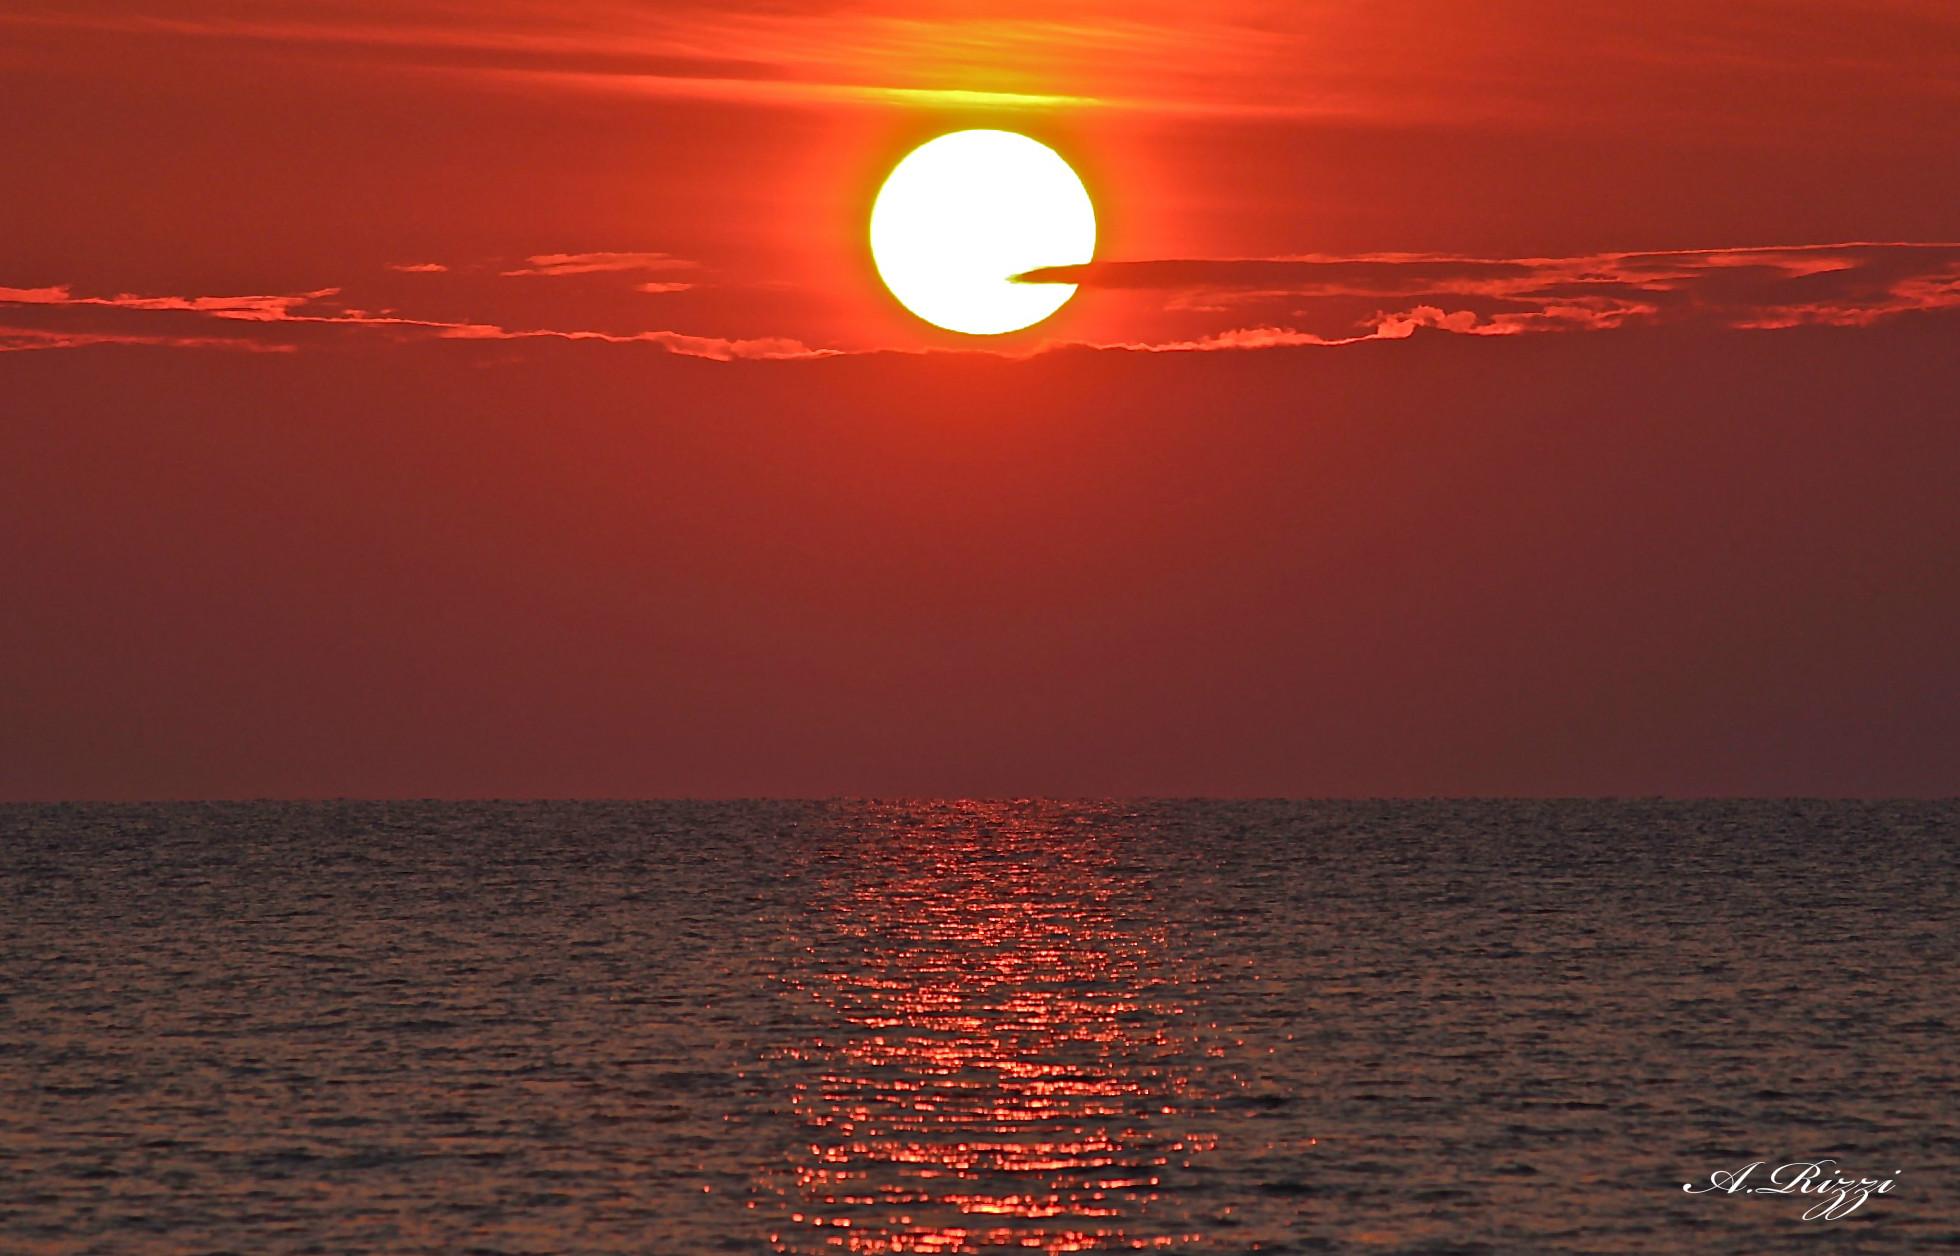 Tramonto al mare juzaphoto for Sfondi desktop tramonti